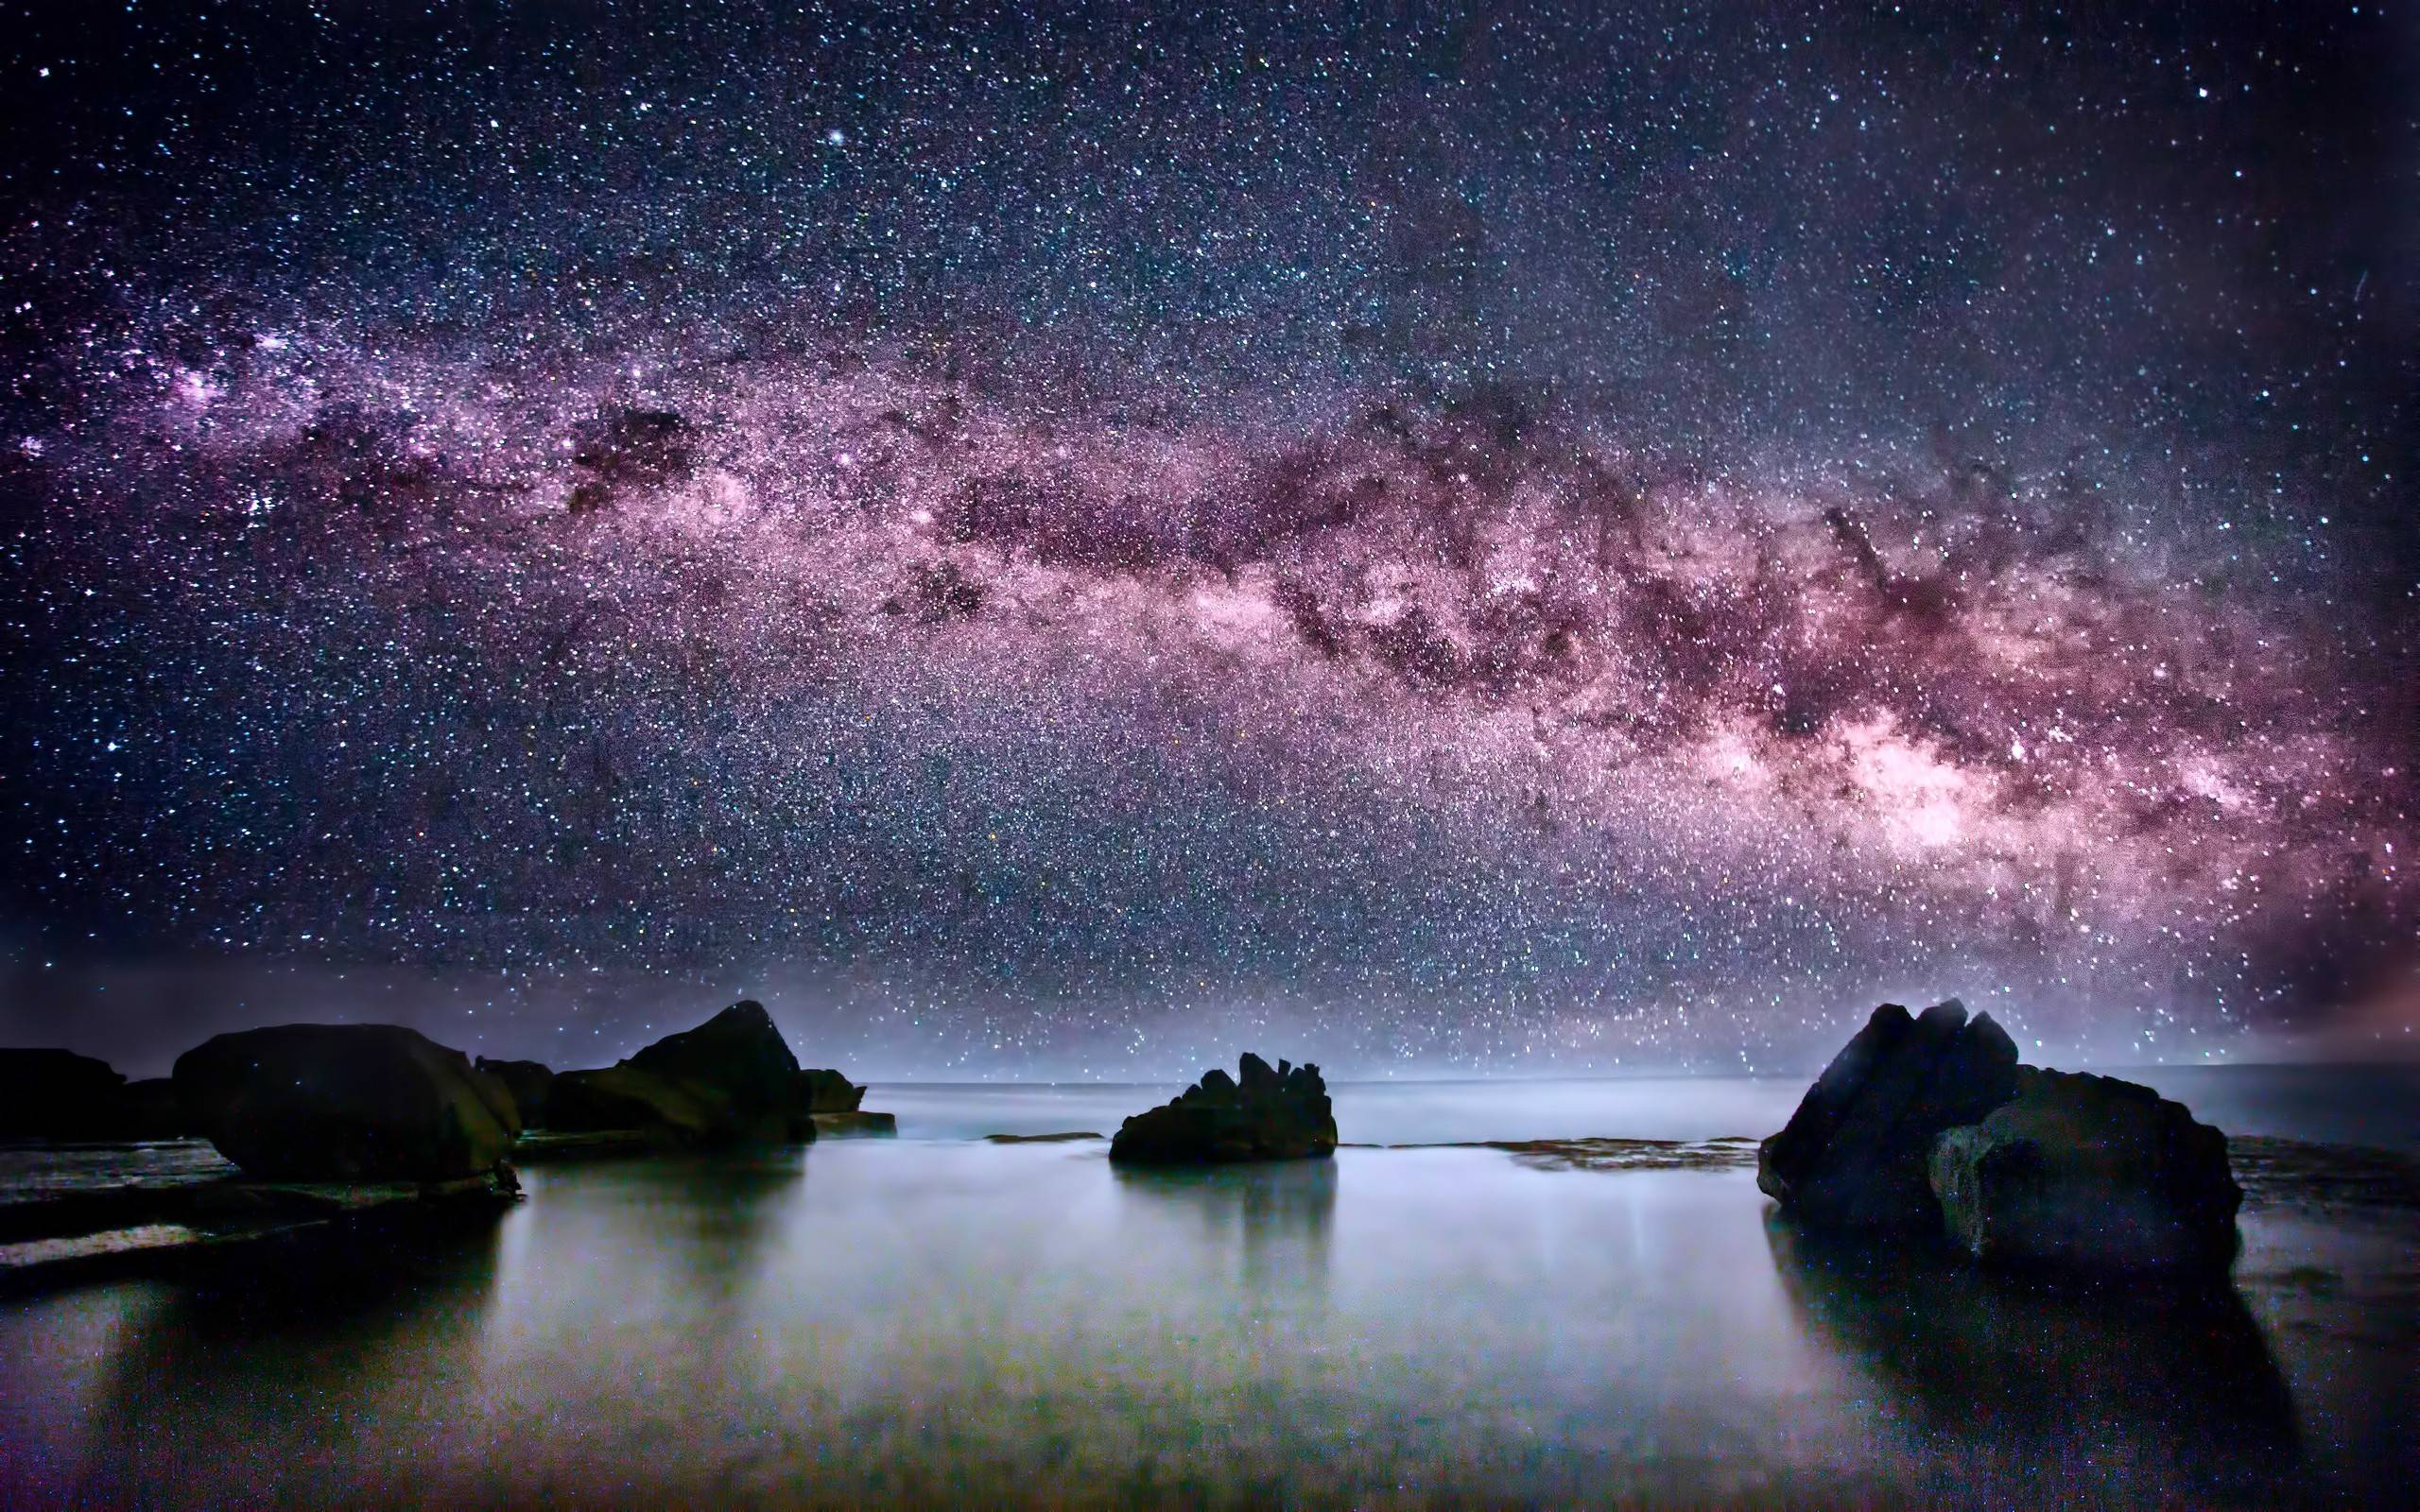 75 Milky Way Wallpaper On Wallpapersafari